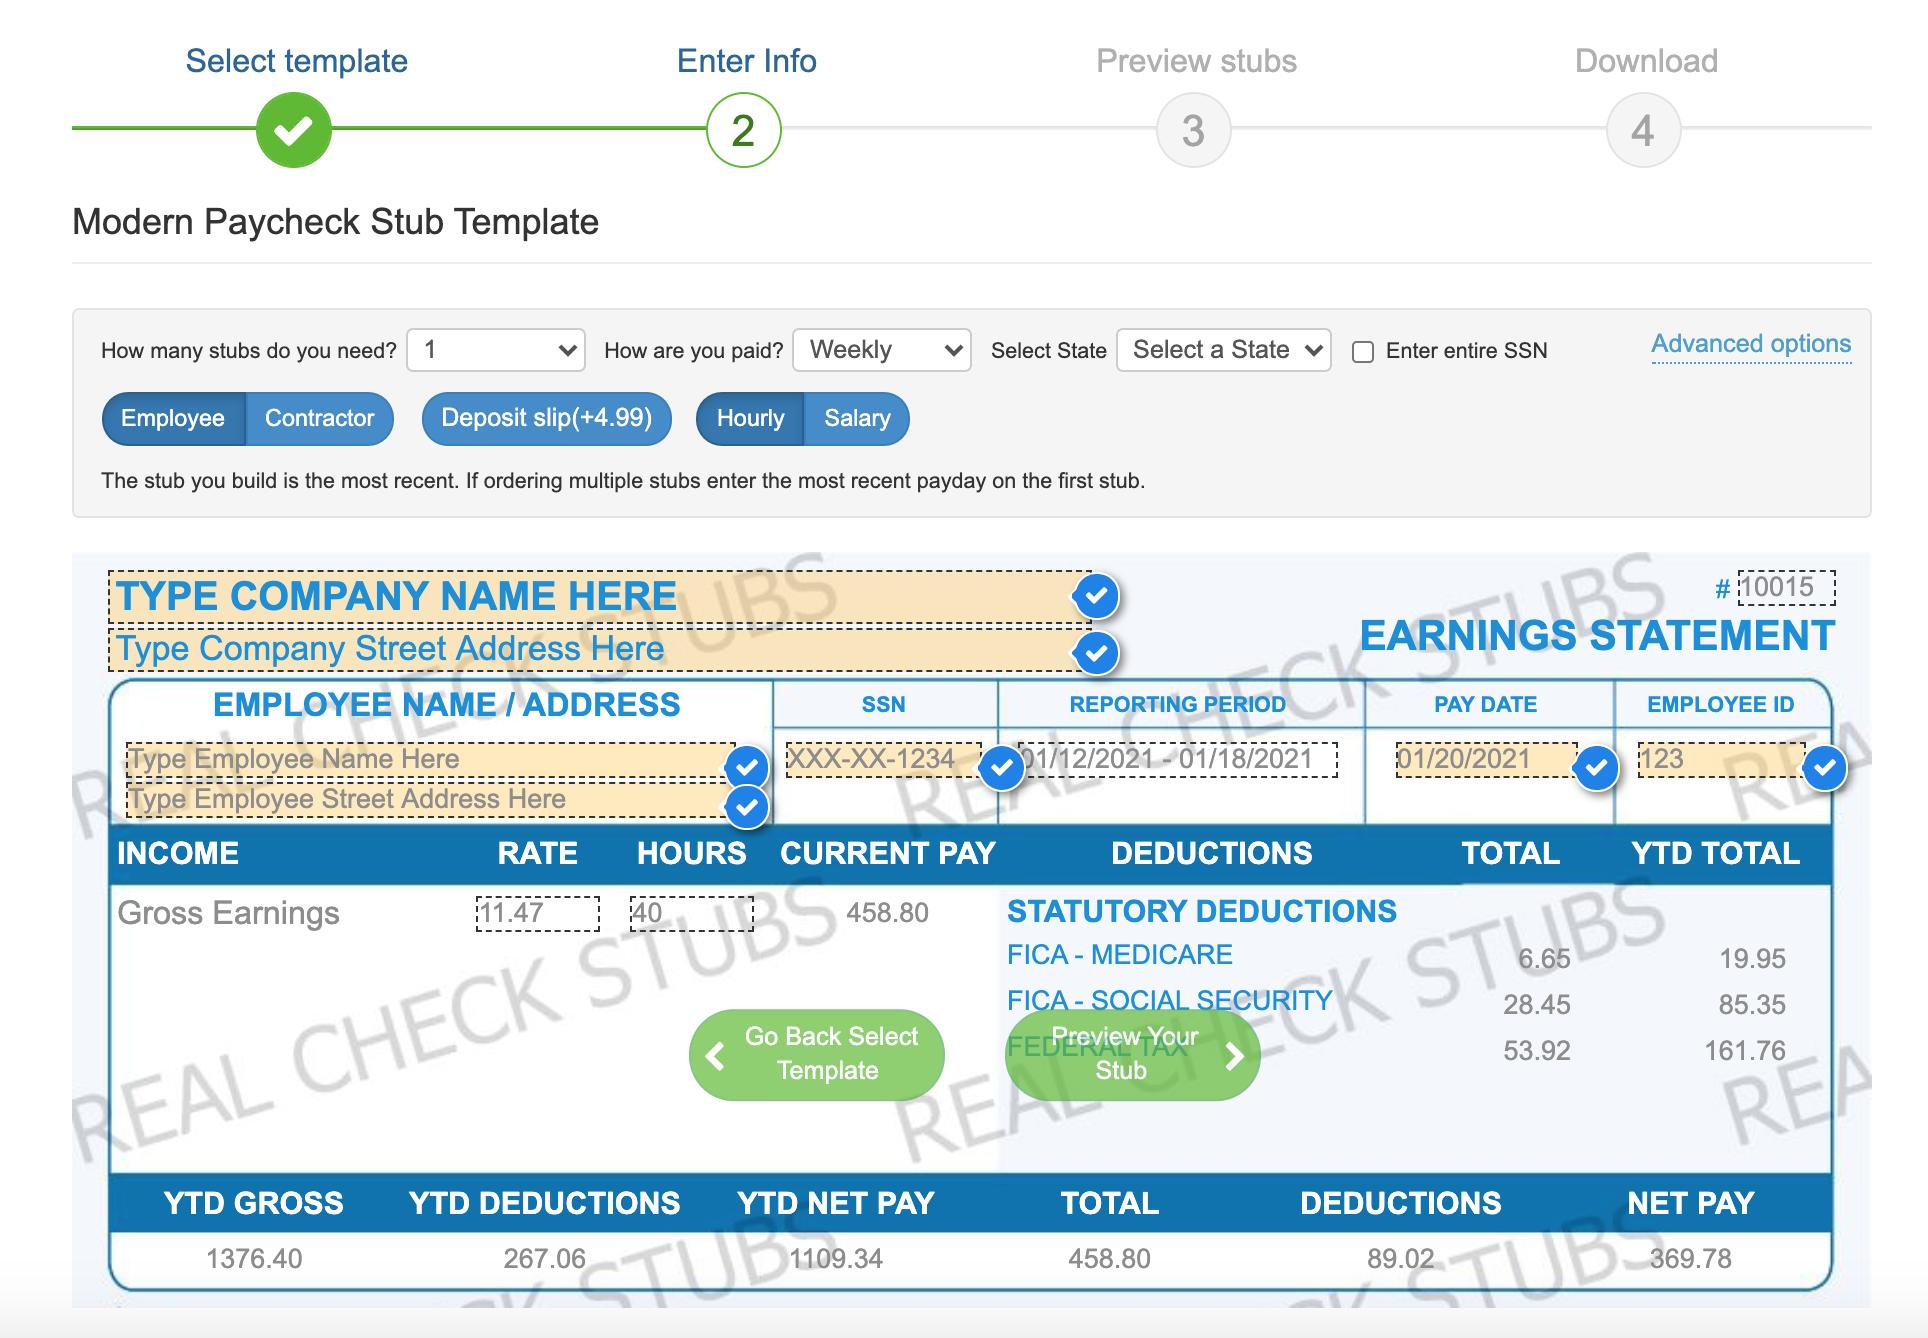 enter pay stub info realcheckstubs.png